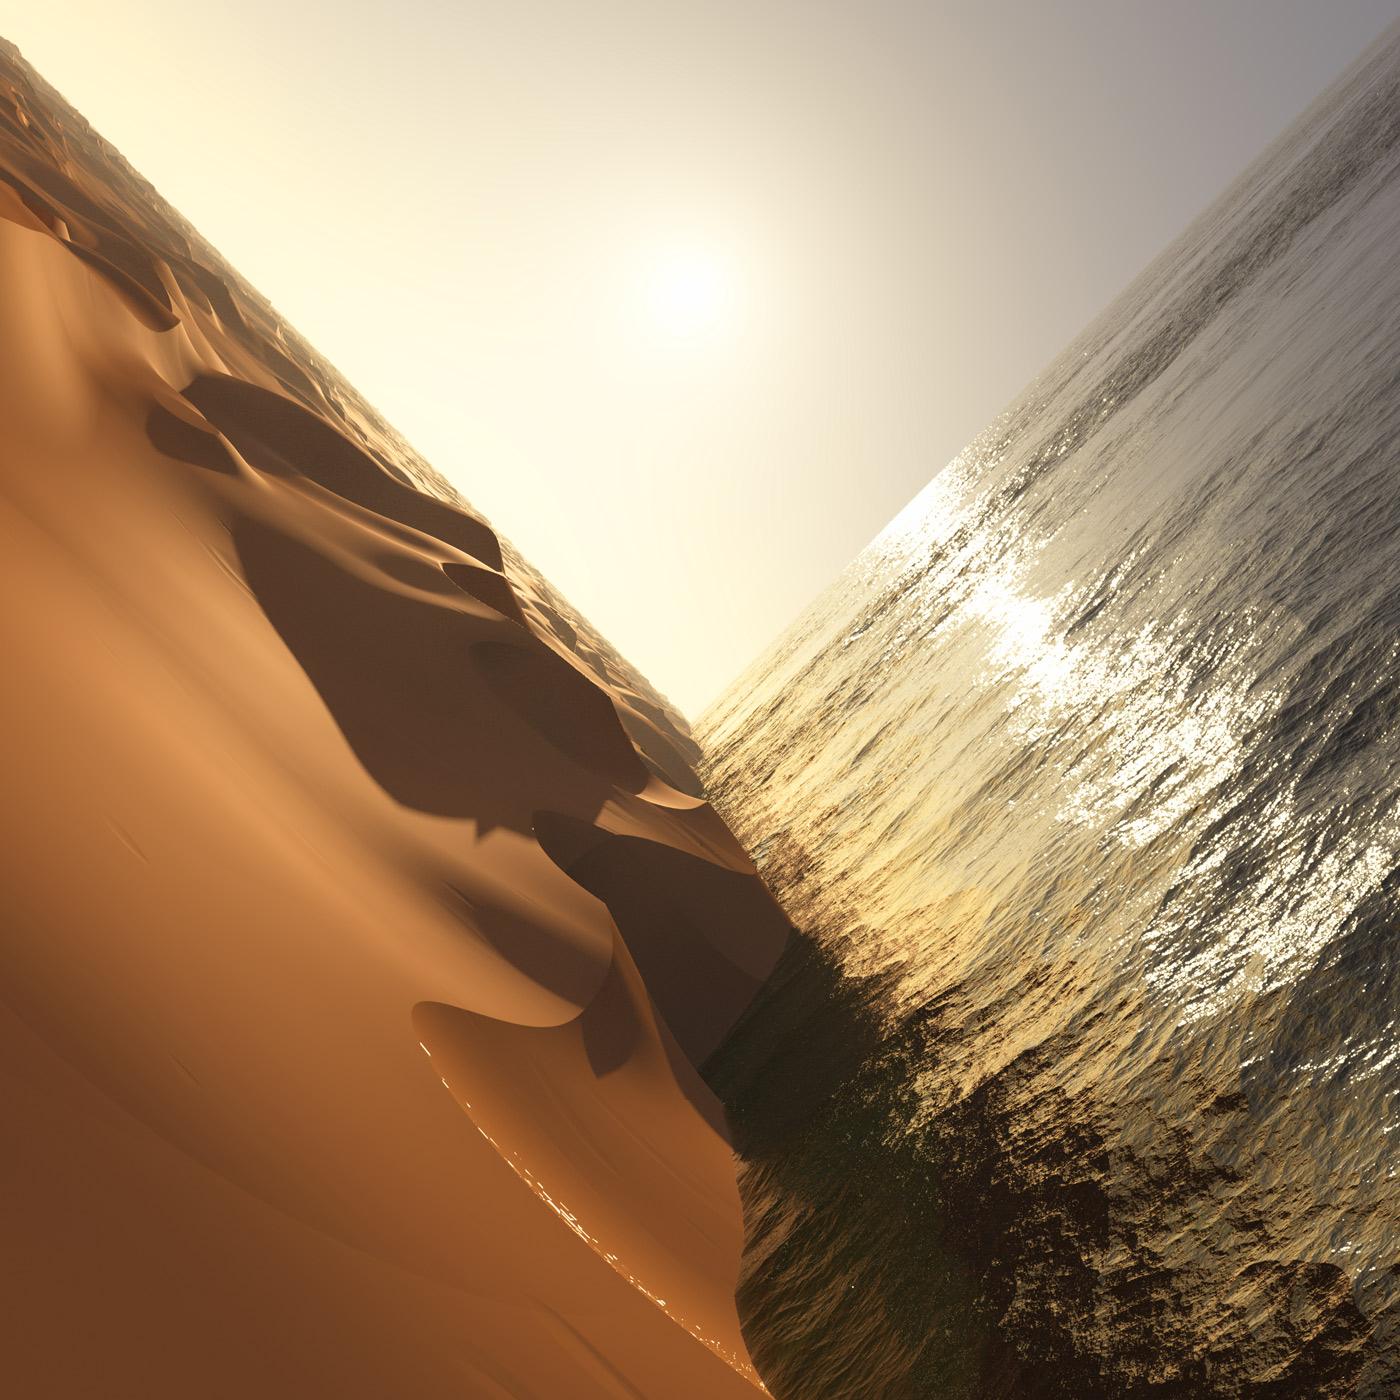 Mark Pritchard x Jonathan Zawada - Under the Sun